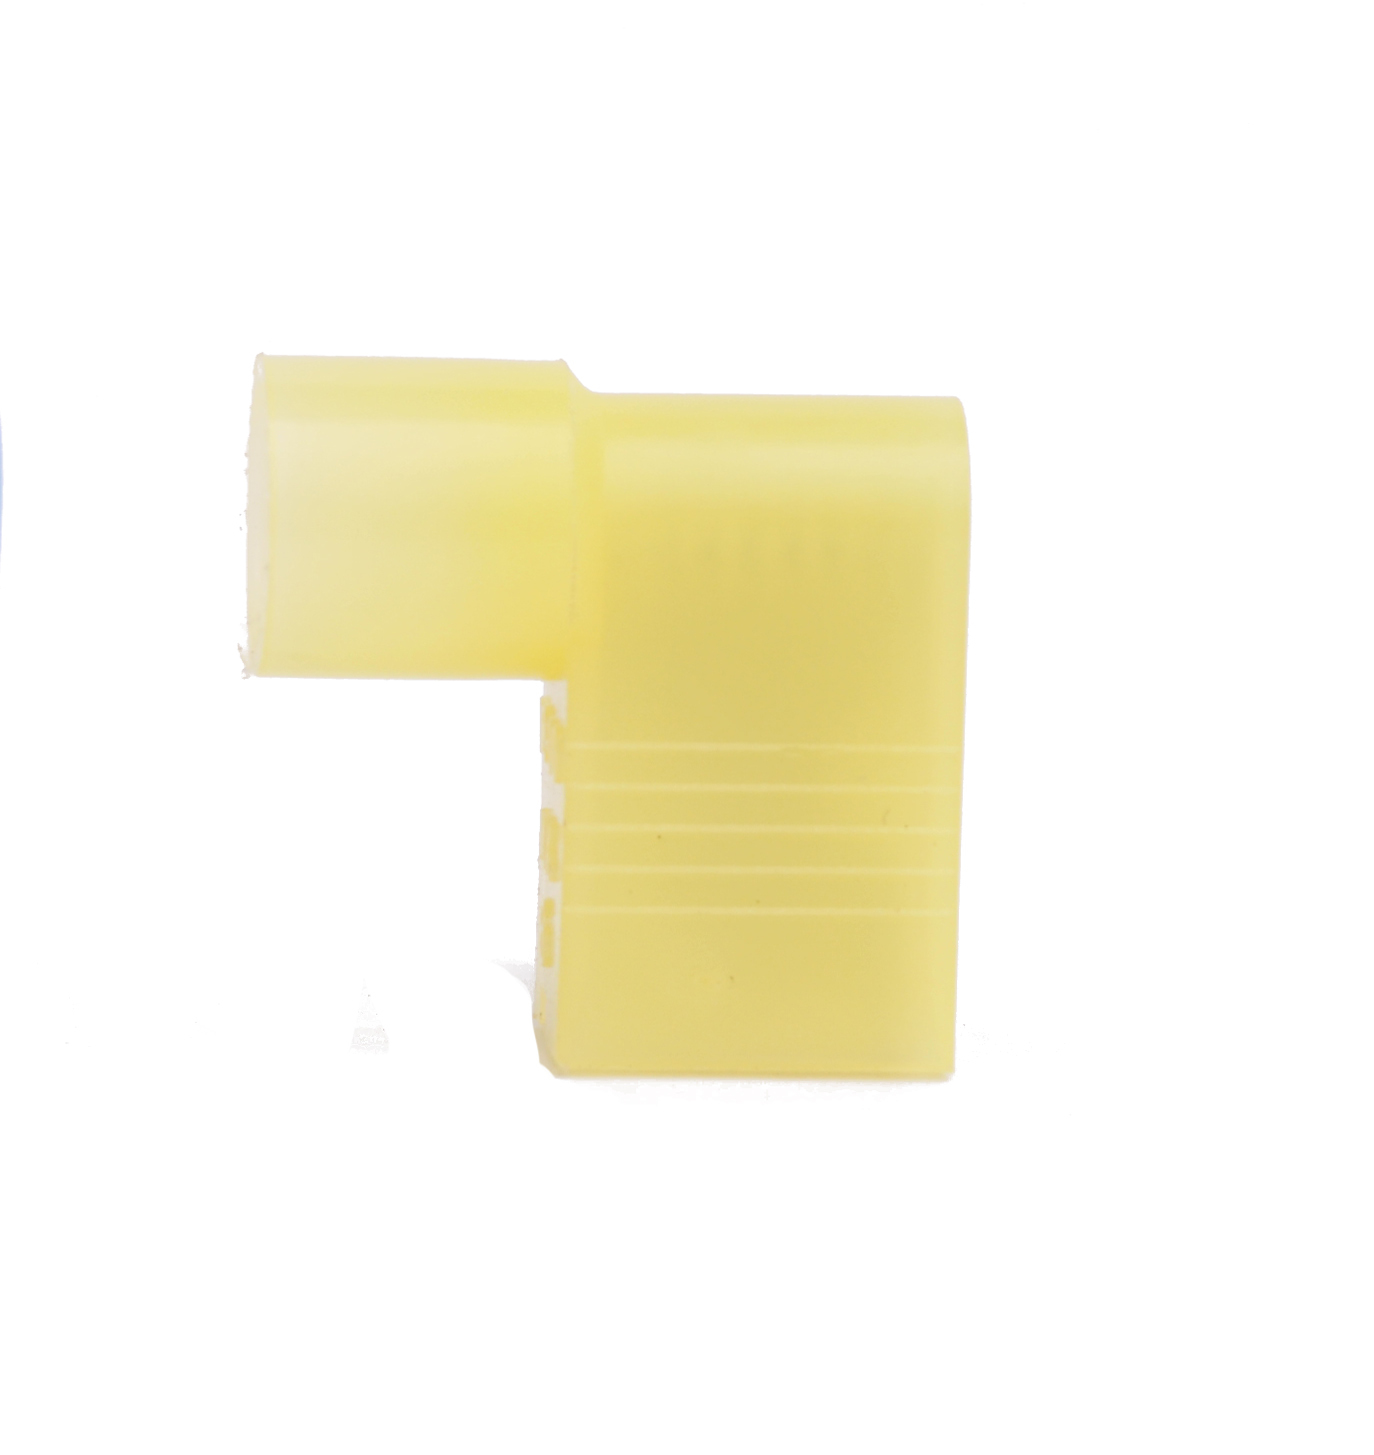 12-10 F/I Nylon Insulated .250 Flag FQC